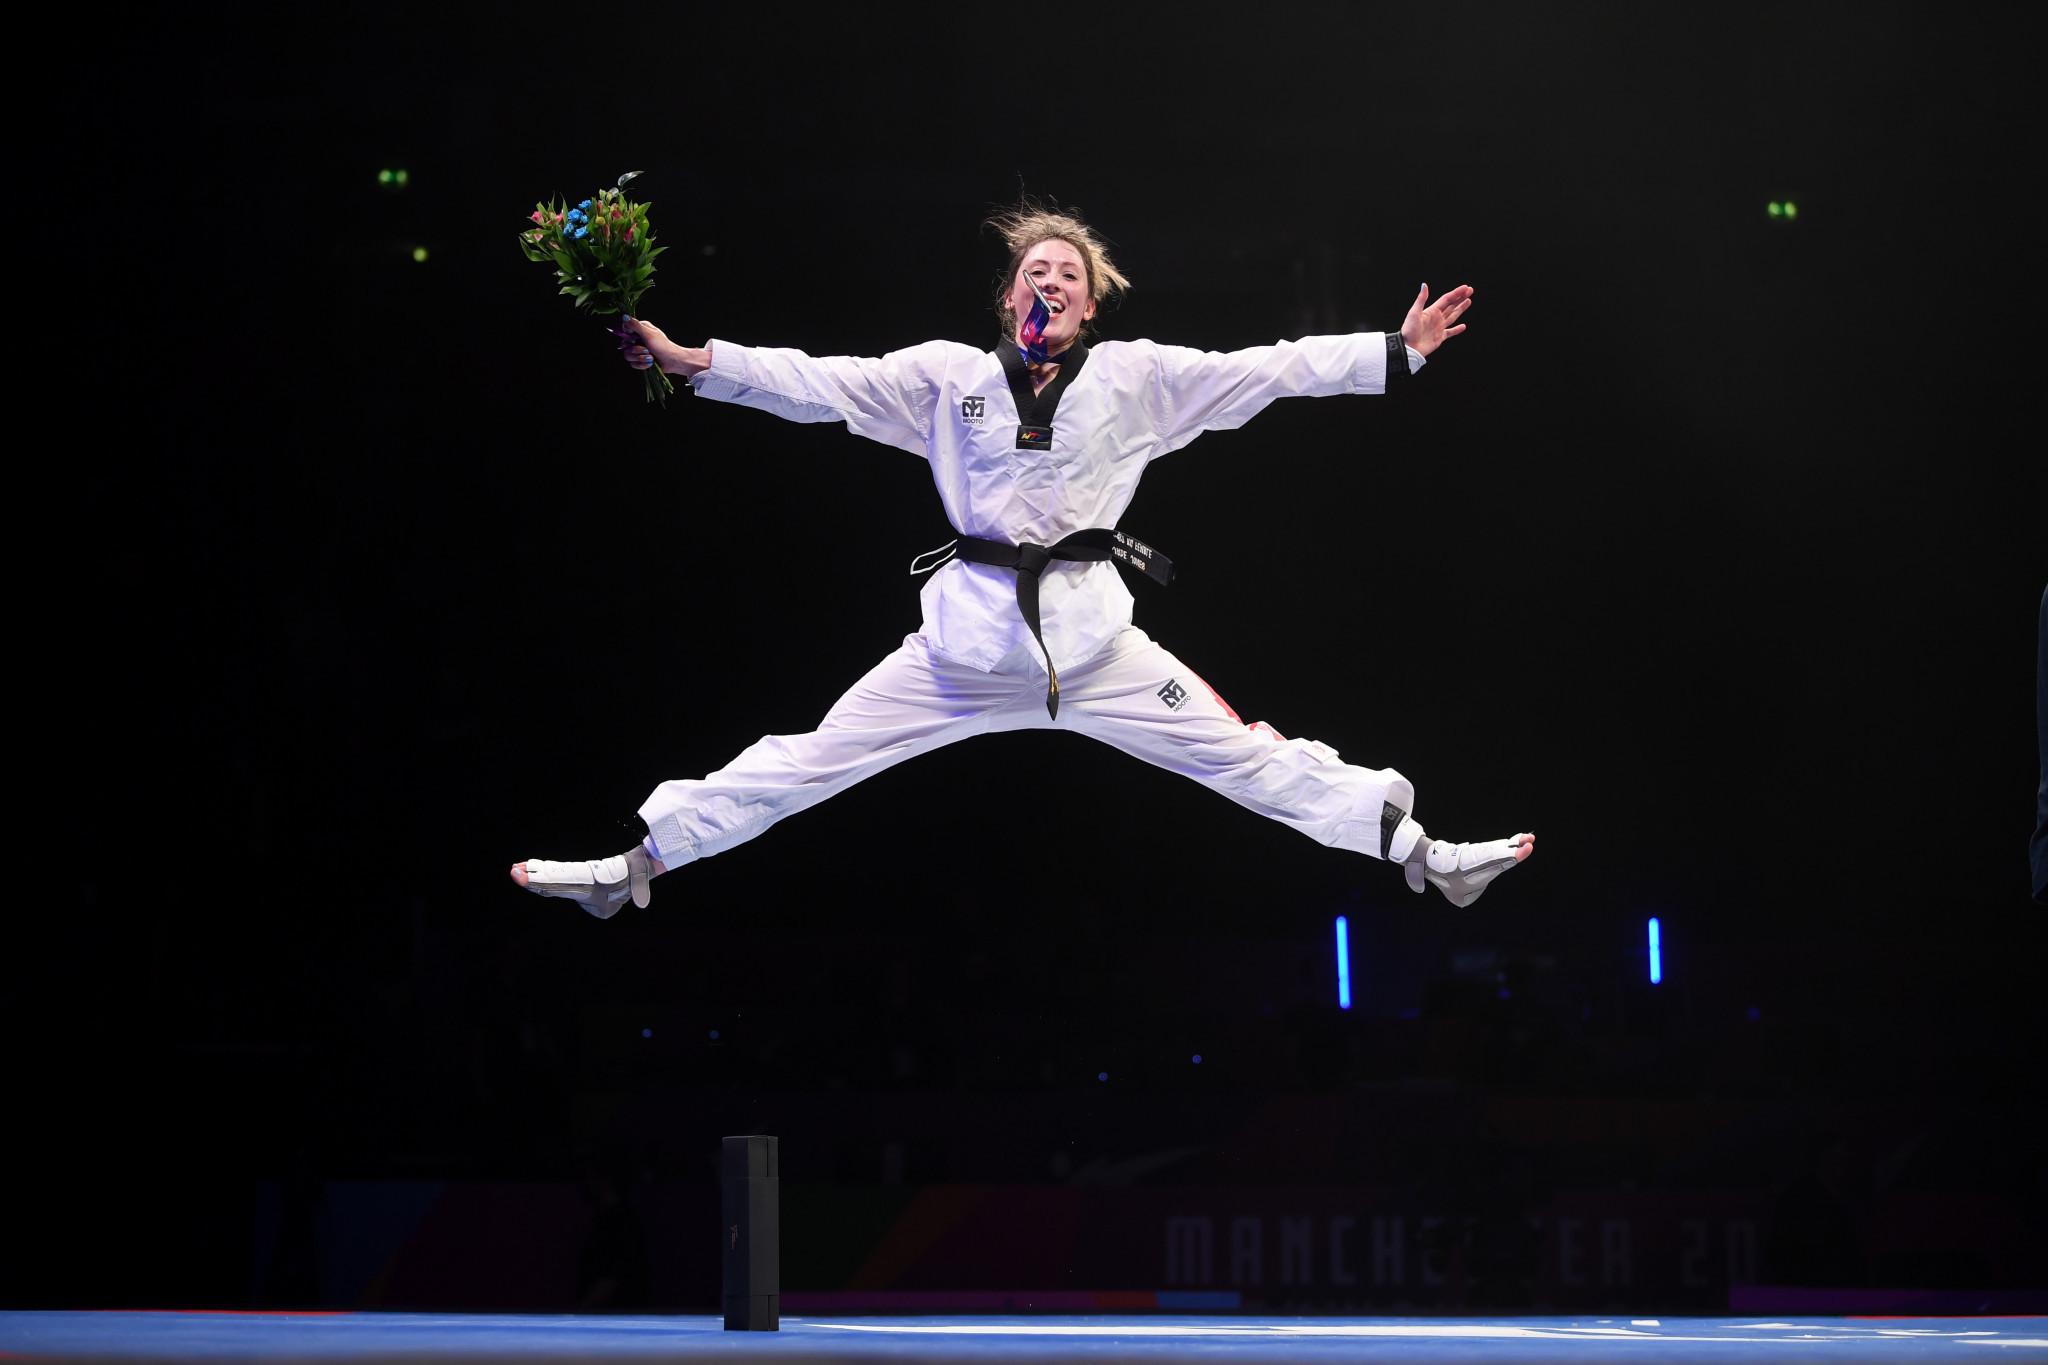 Jones seeks legendary status with third Olympic gold at Tokyo 2020